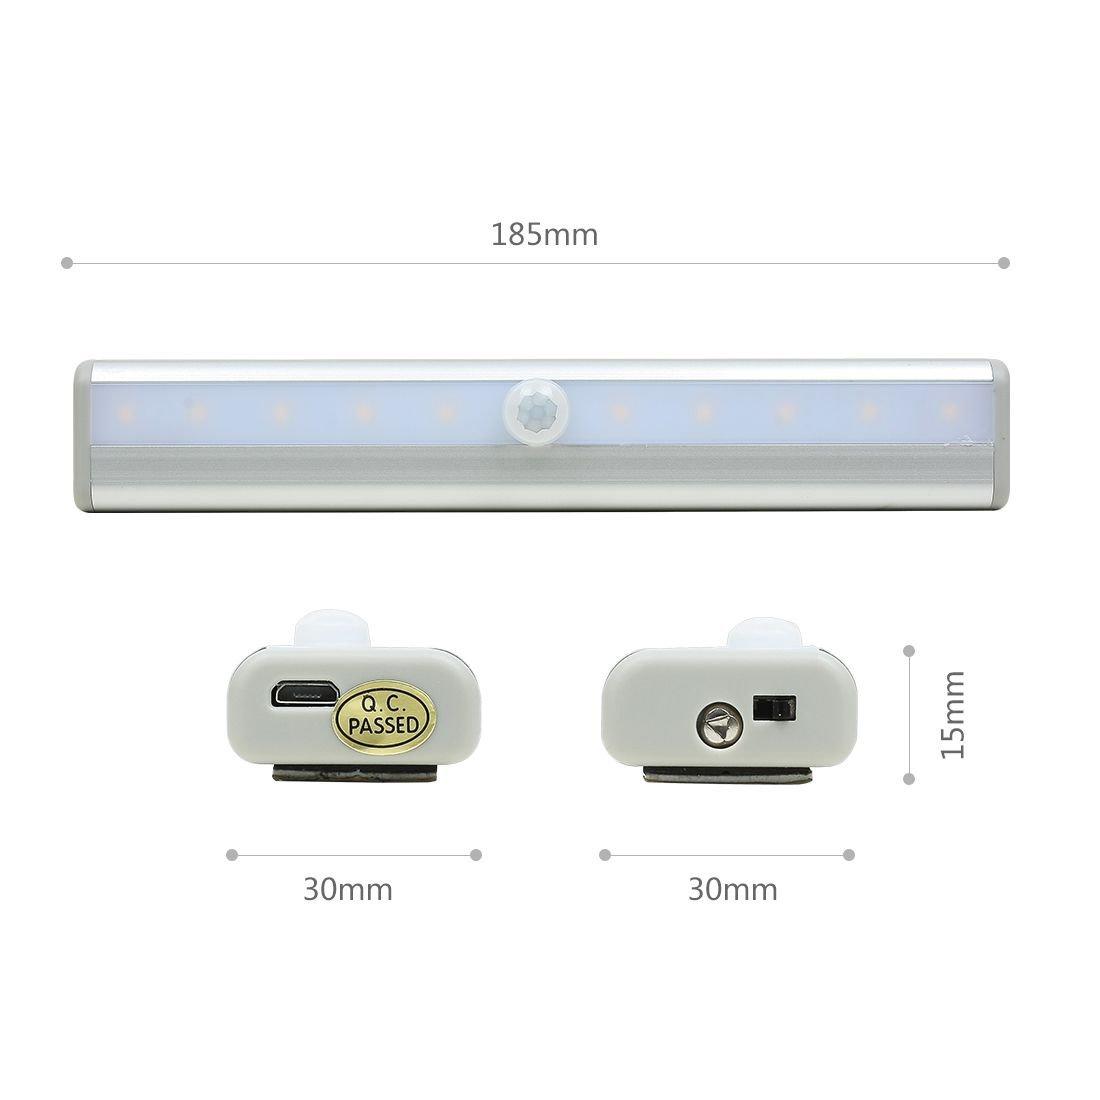 eDealMax PIR recargable con sensor de movimiento de luz LED portátil de movimiento inalámbrico Sensor de luz de la noche de Pasillo Escaleras Armario Baño ...